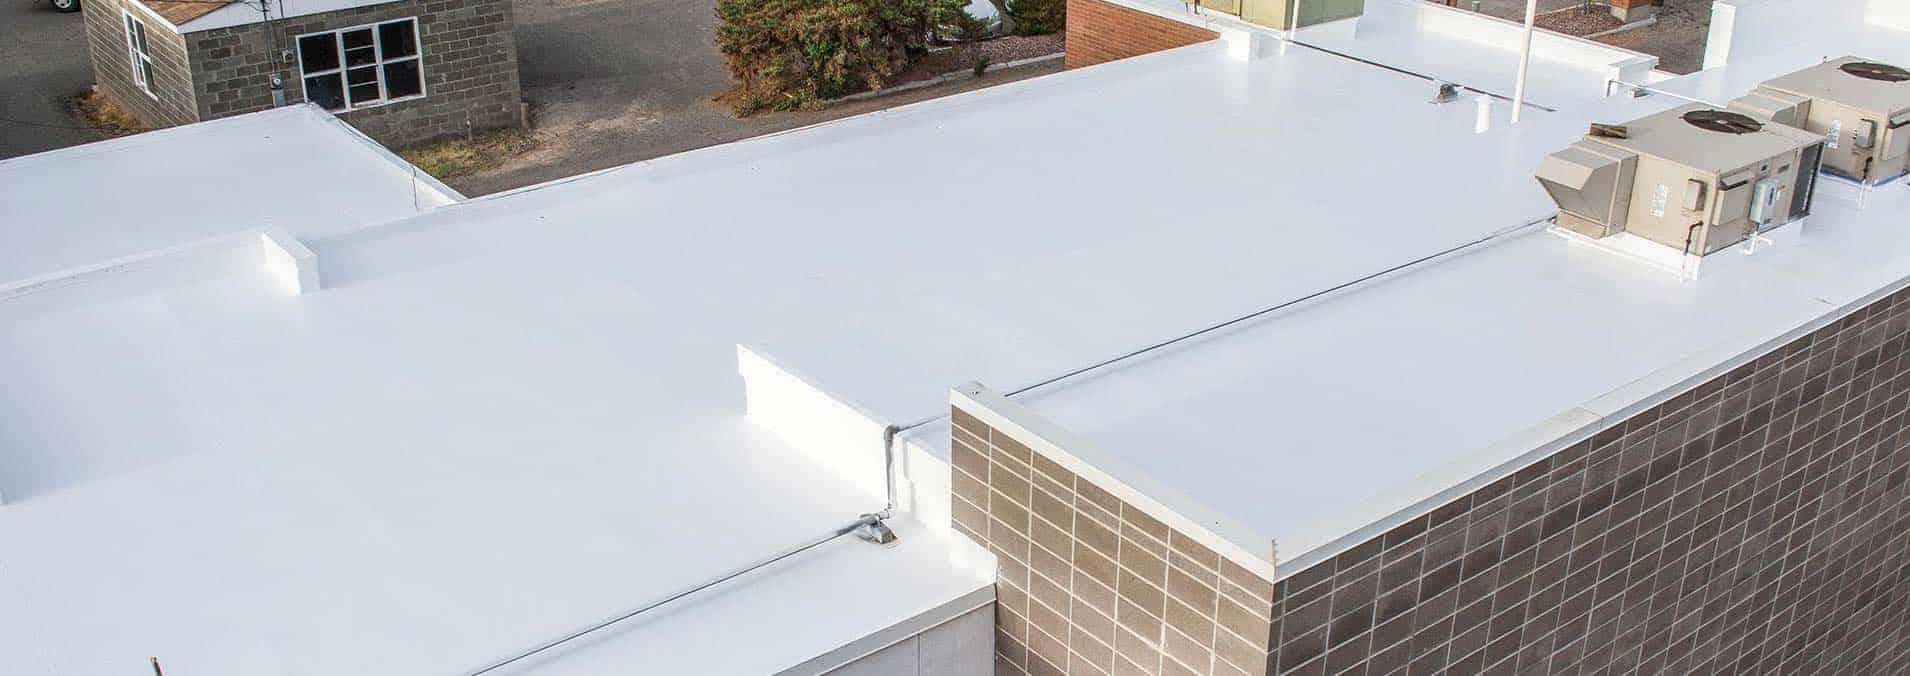 Commercial Roofer Atlanta, GA